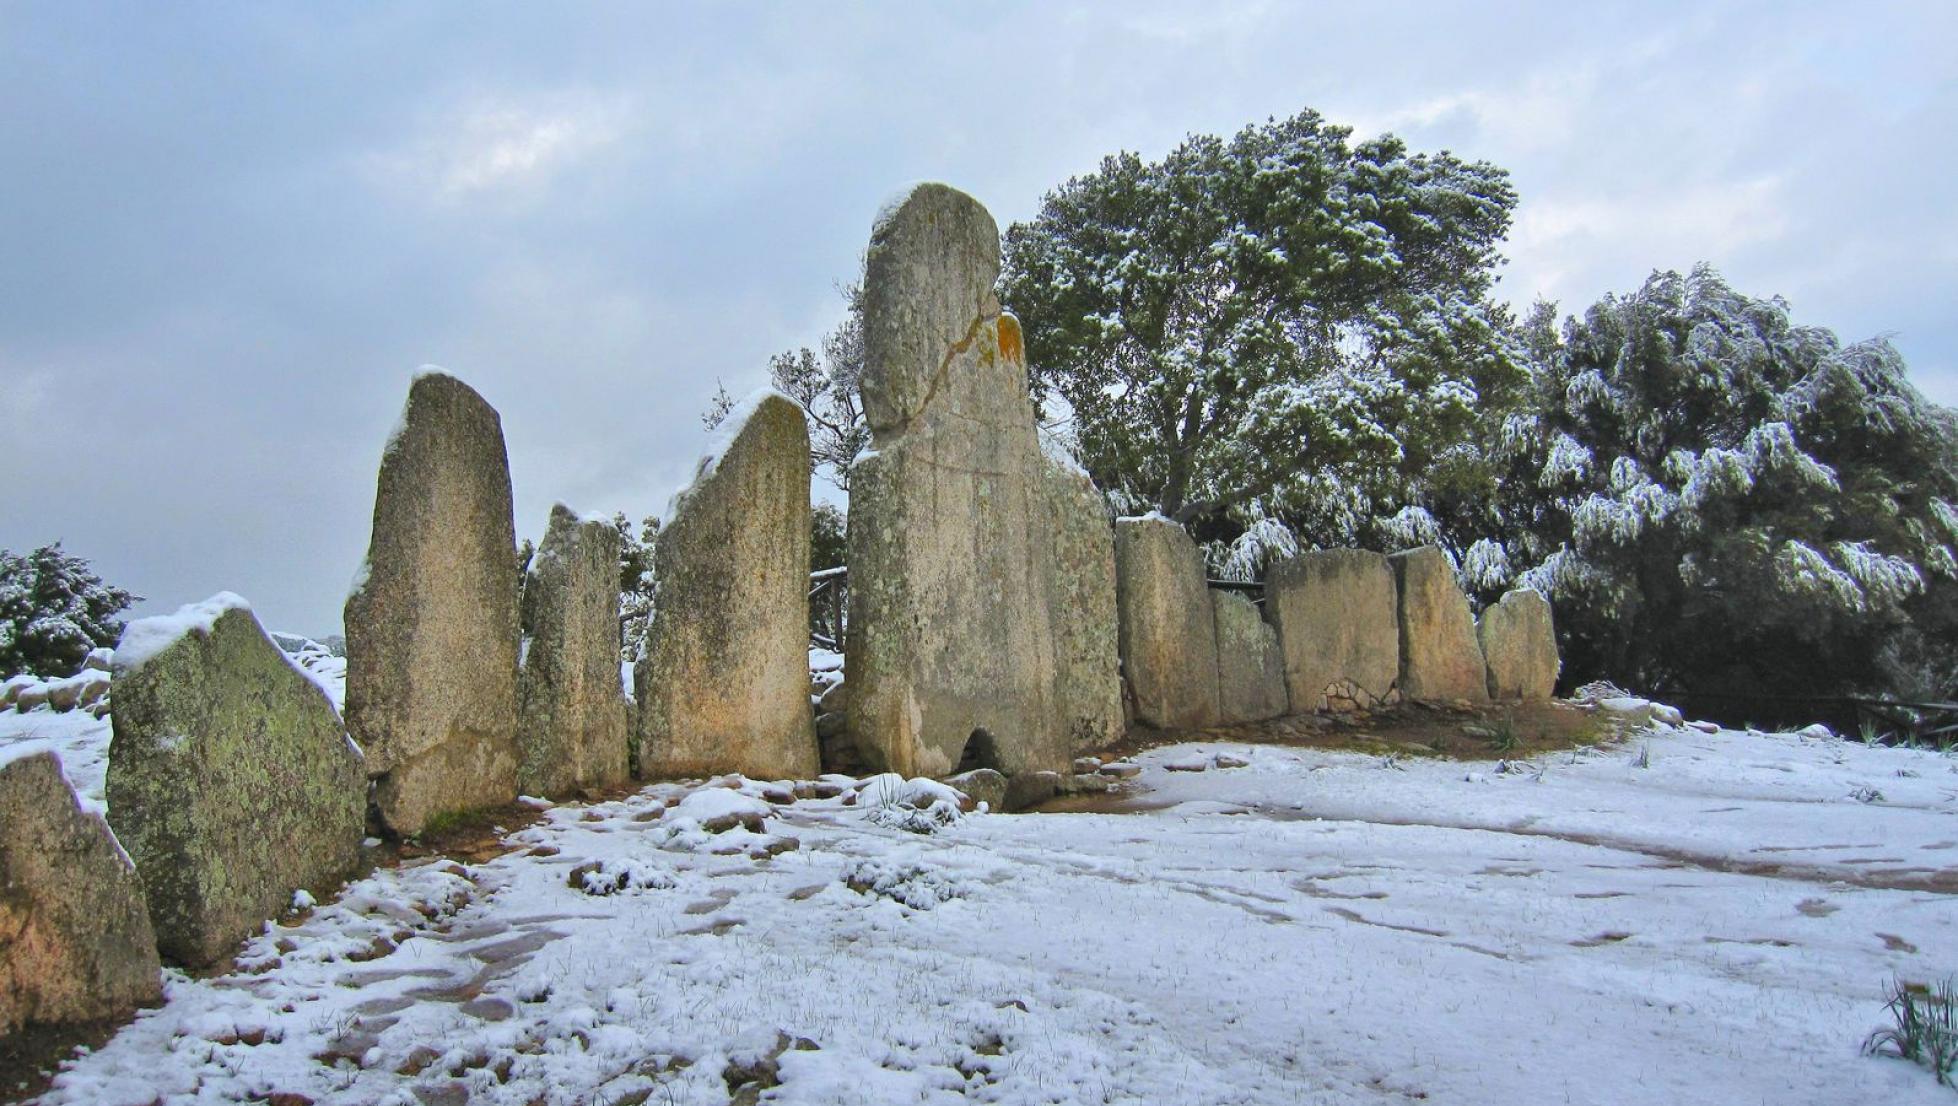 Tomba di Giganti Li Lolghi - Arzachena